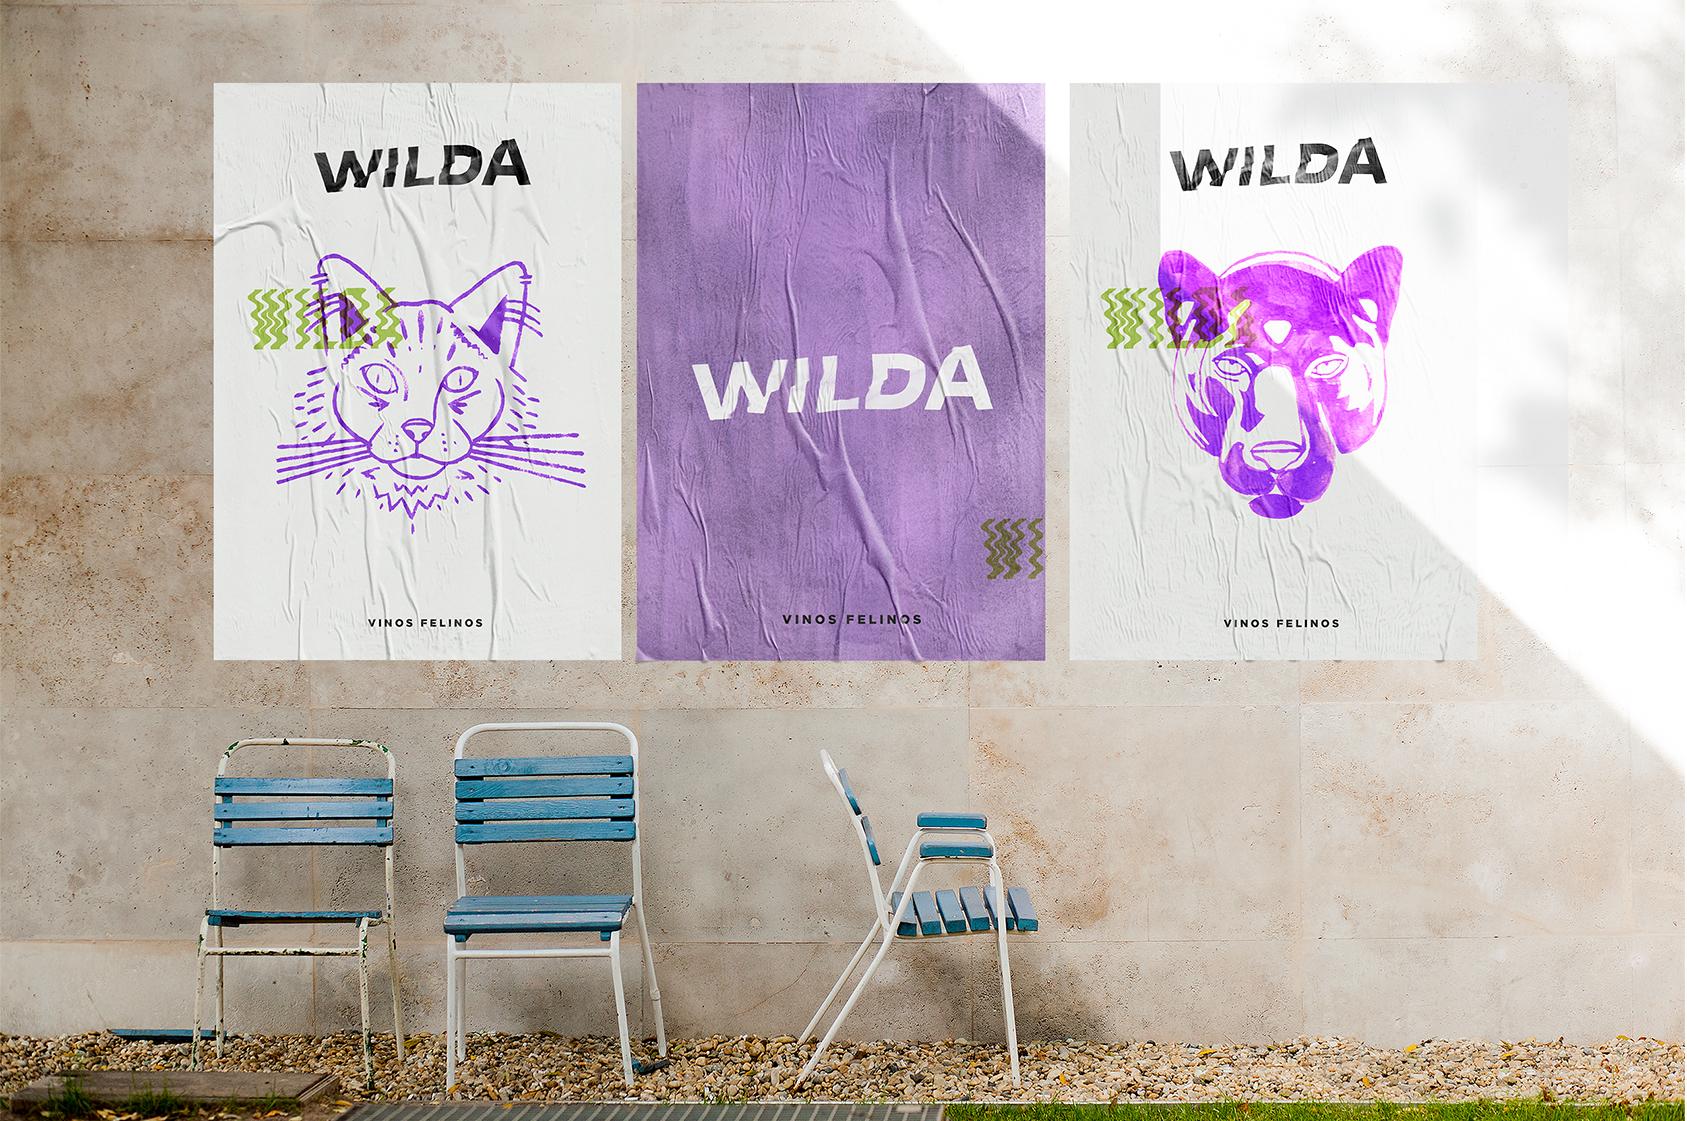 Wilda-ANGEL-ESPINOSA-08